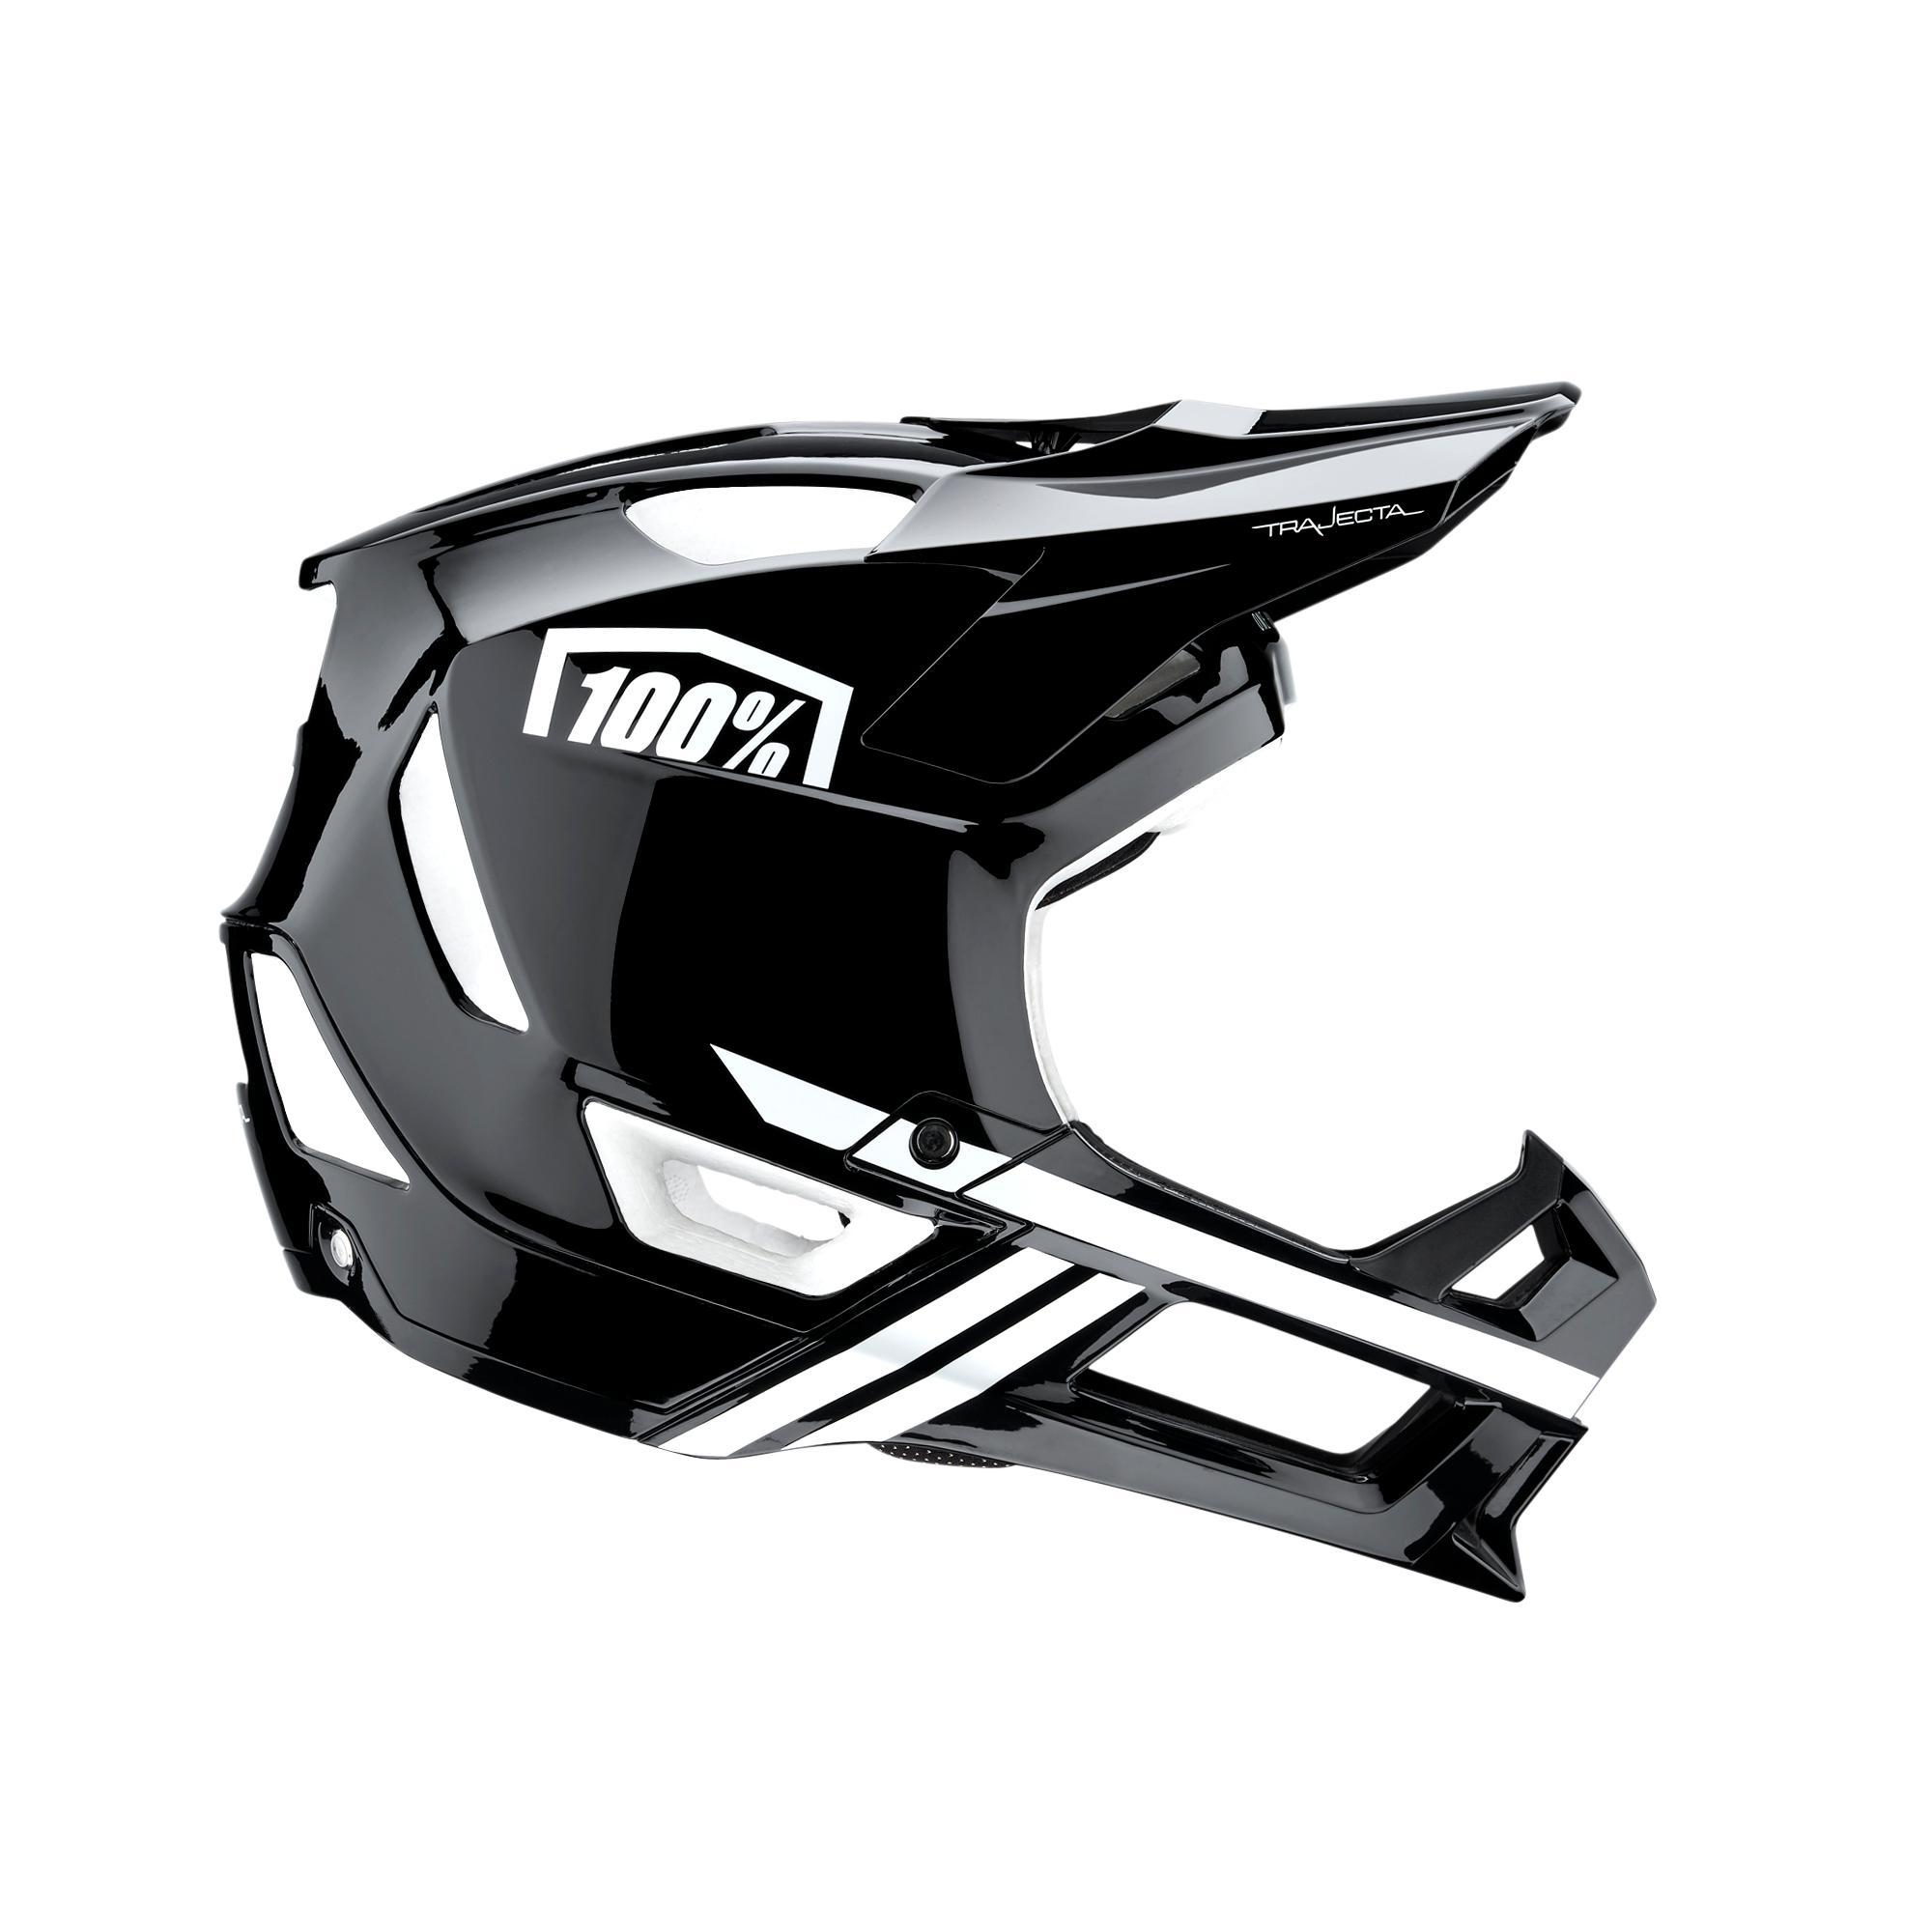 TRAJECTA Helmet Black/White